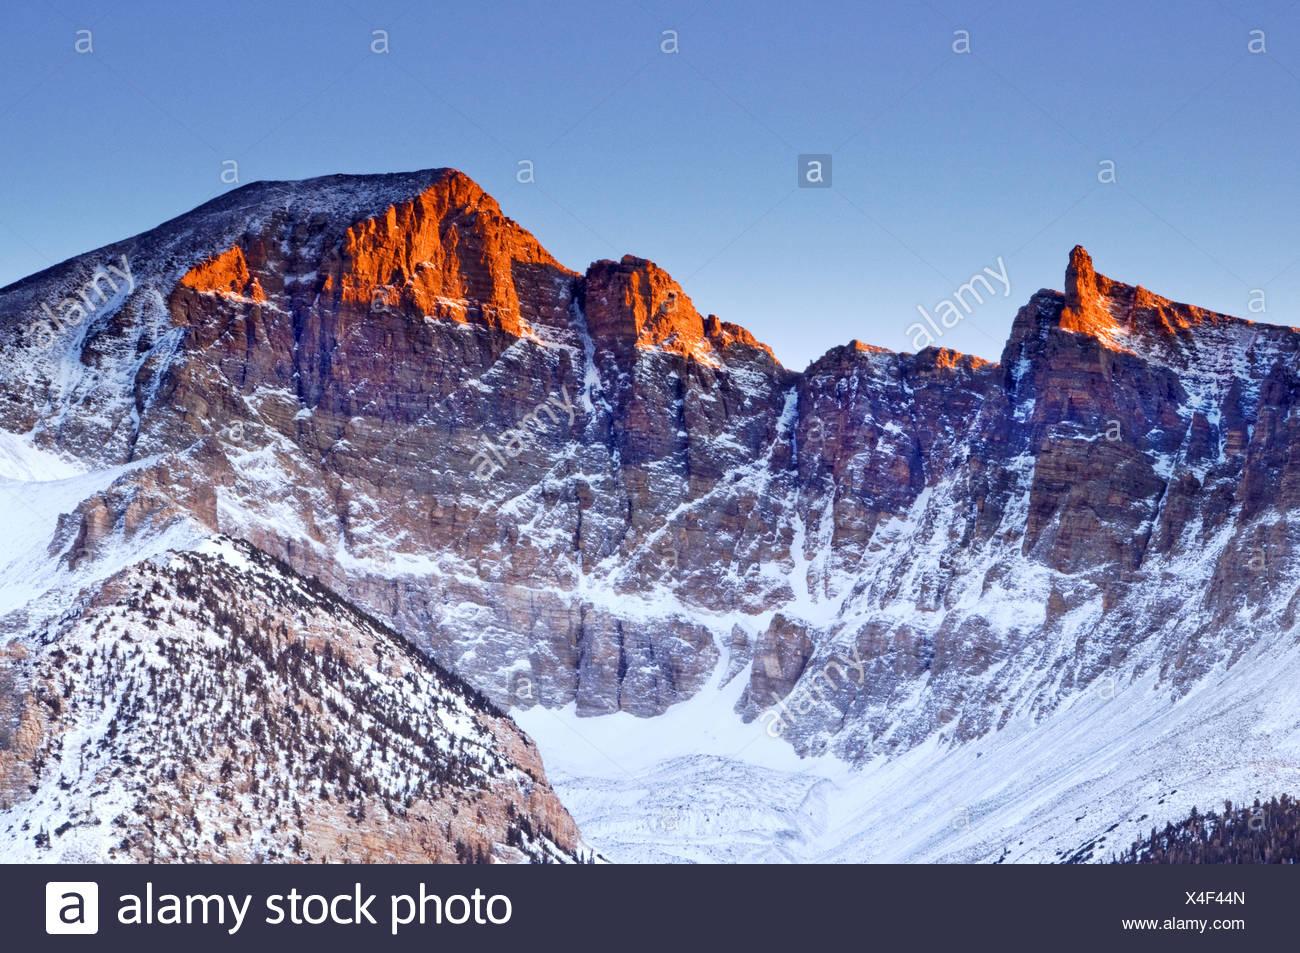 Early morning light illuminates Wheeler Peak in Great Basin National Park. Stock Photo